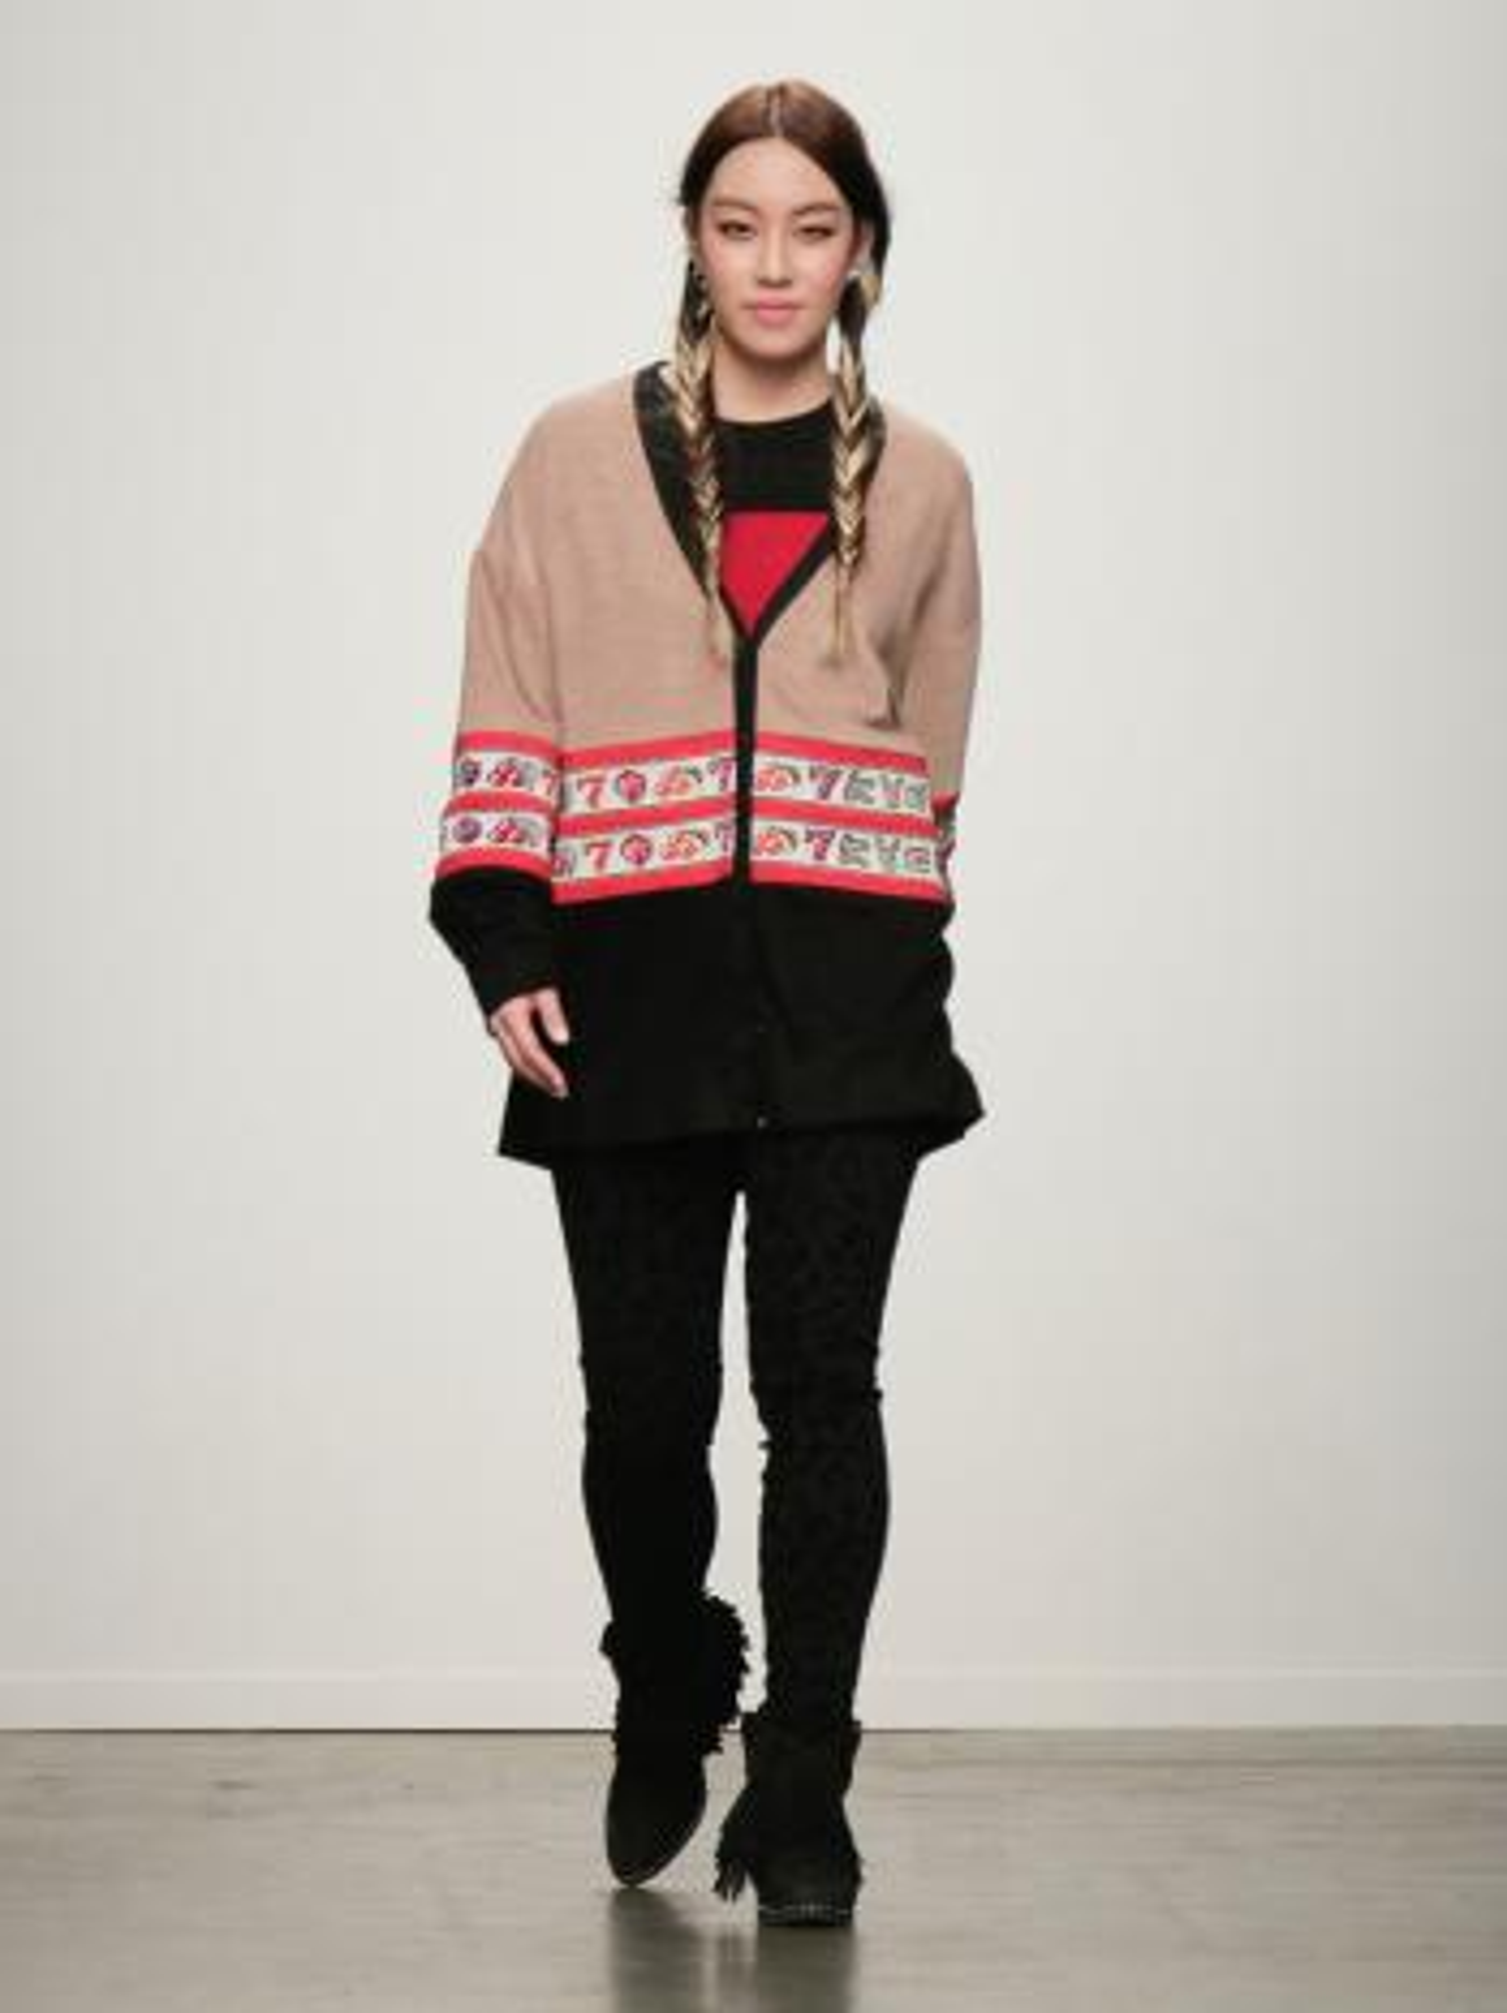 new york fashion week, korea, k-pop, kye, kathleen kye, fashion